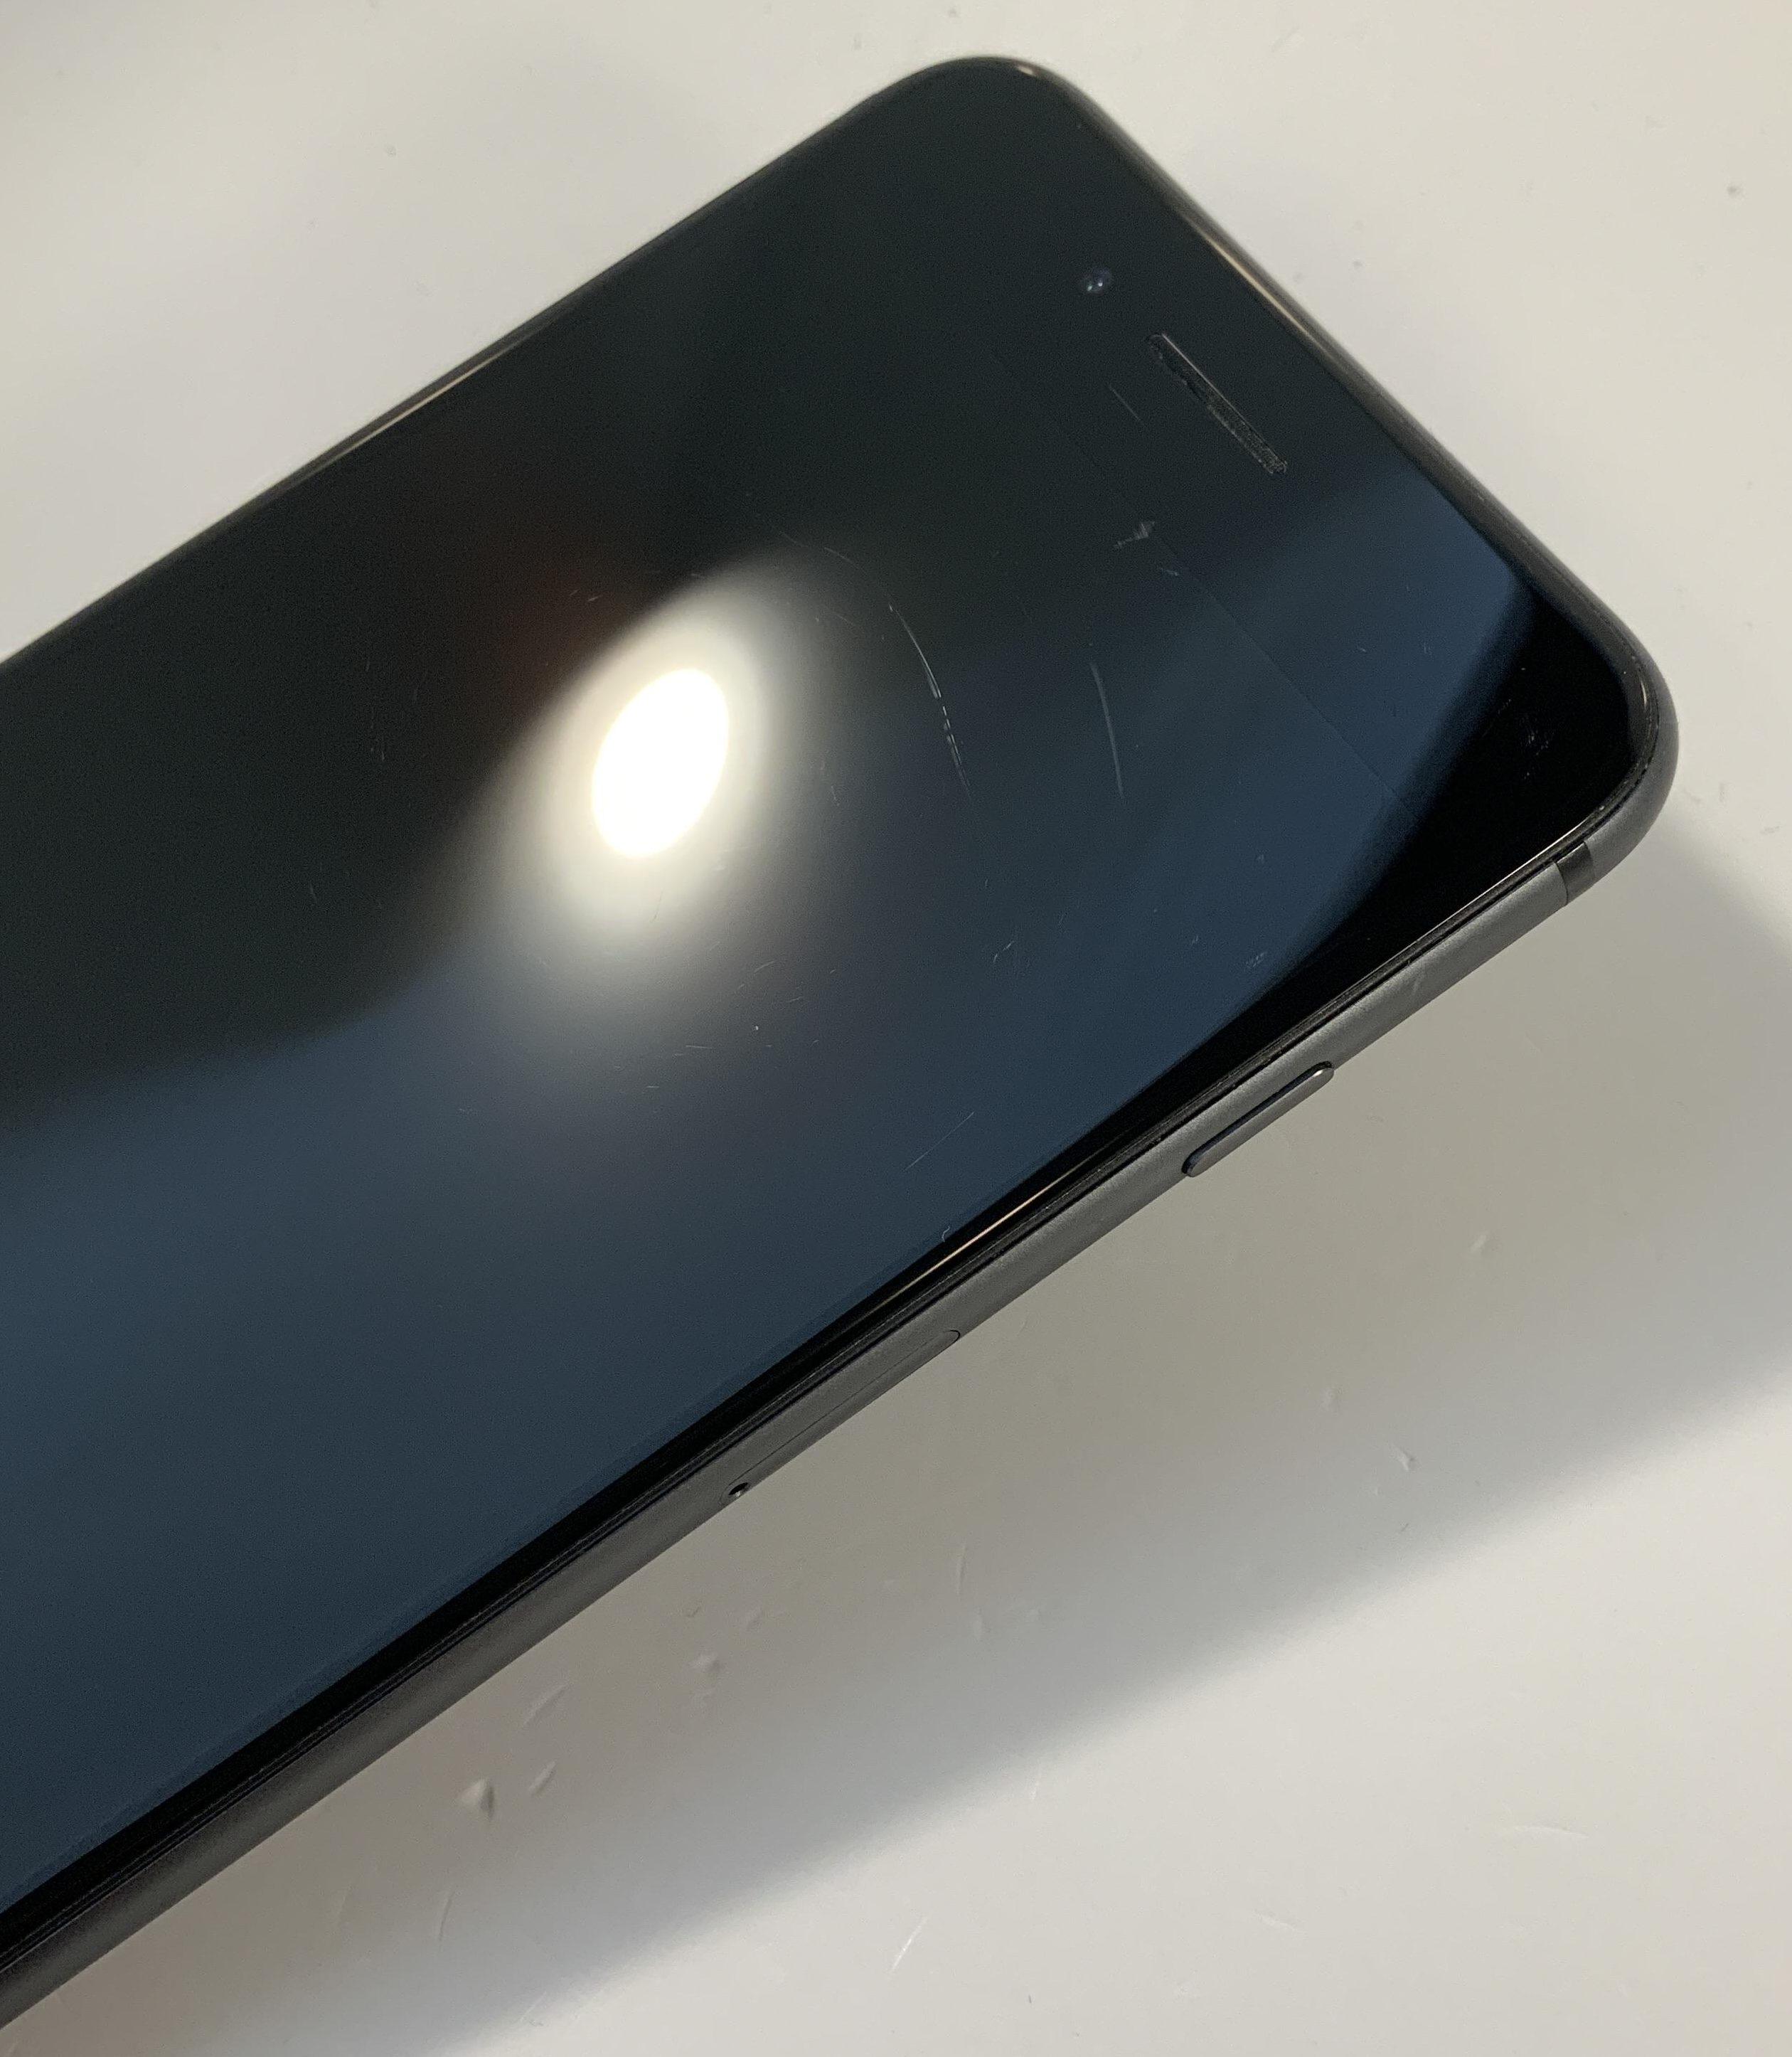 iPhone 8 Plus 64GB, 64GB, Space Gray, immagine 3